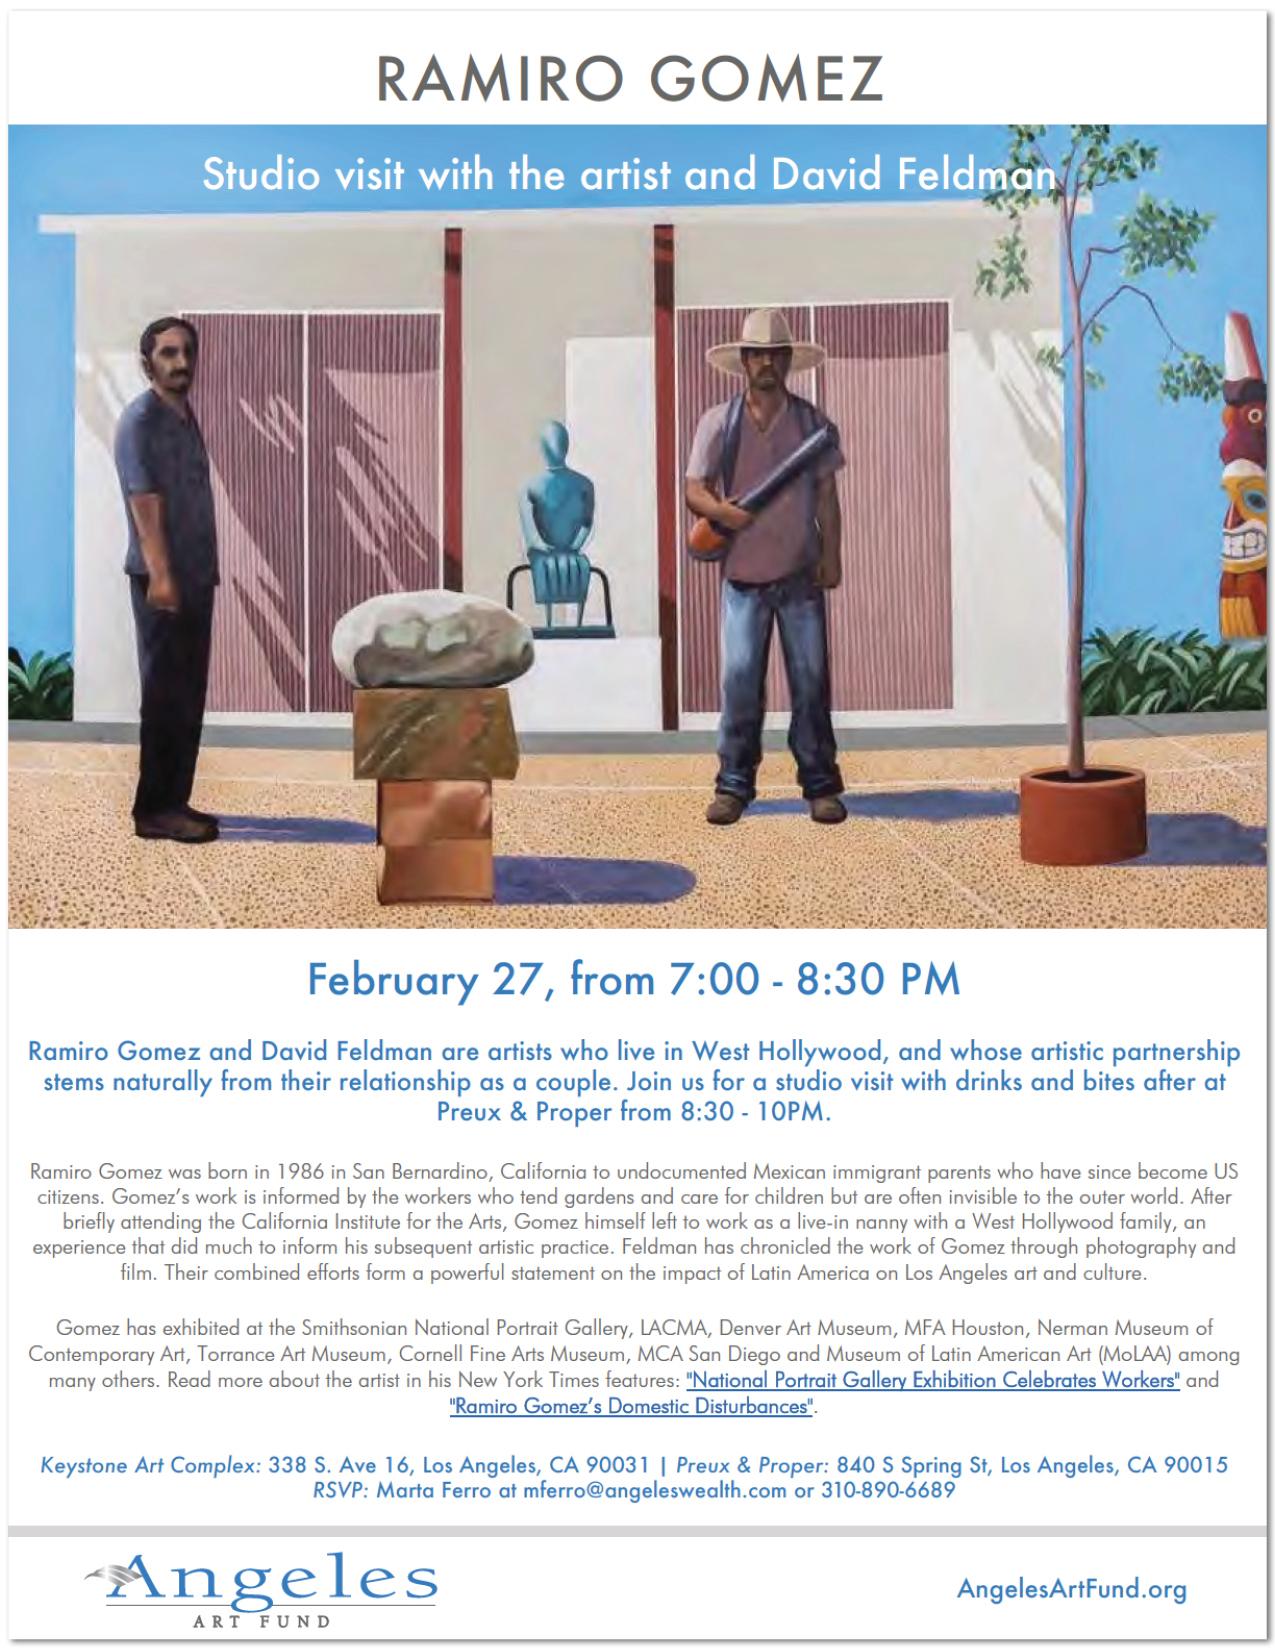 Angeles Art Fund Invites_border3.jpg